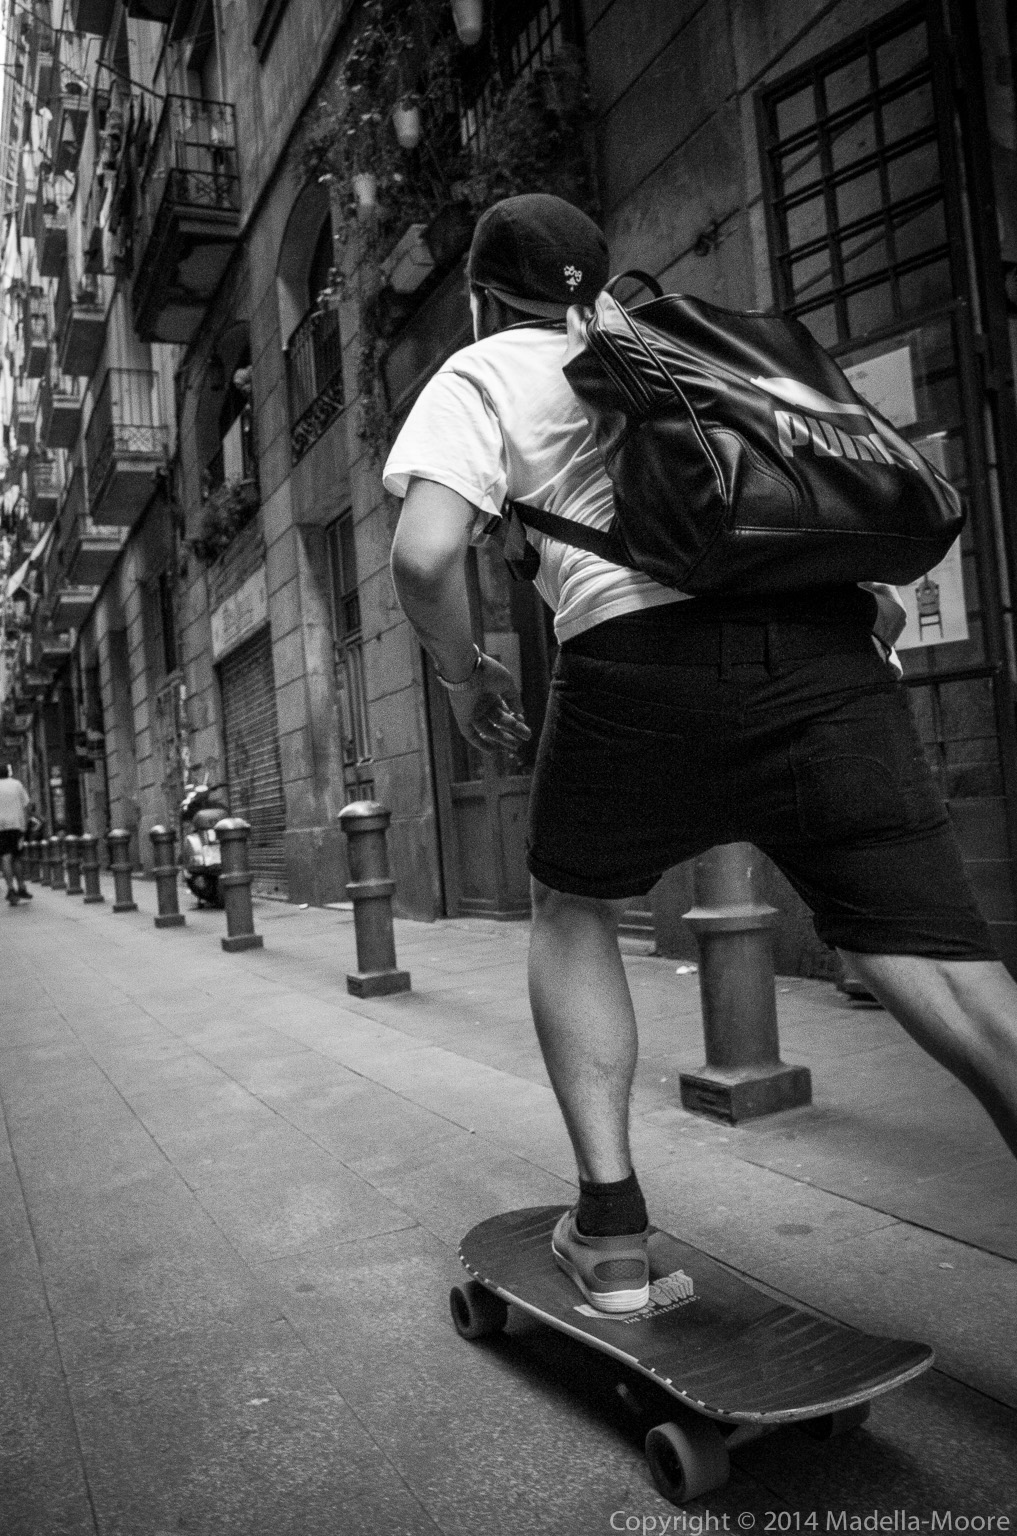 Skateboarder, Barcelona.